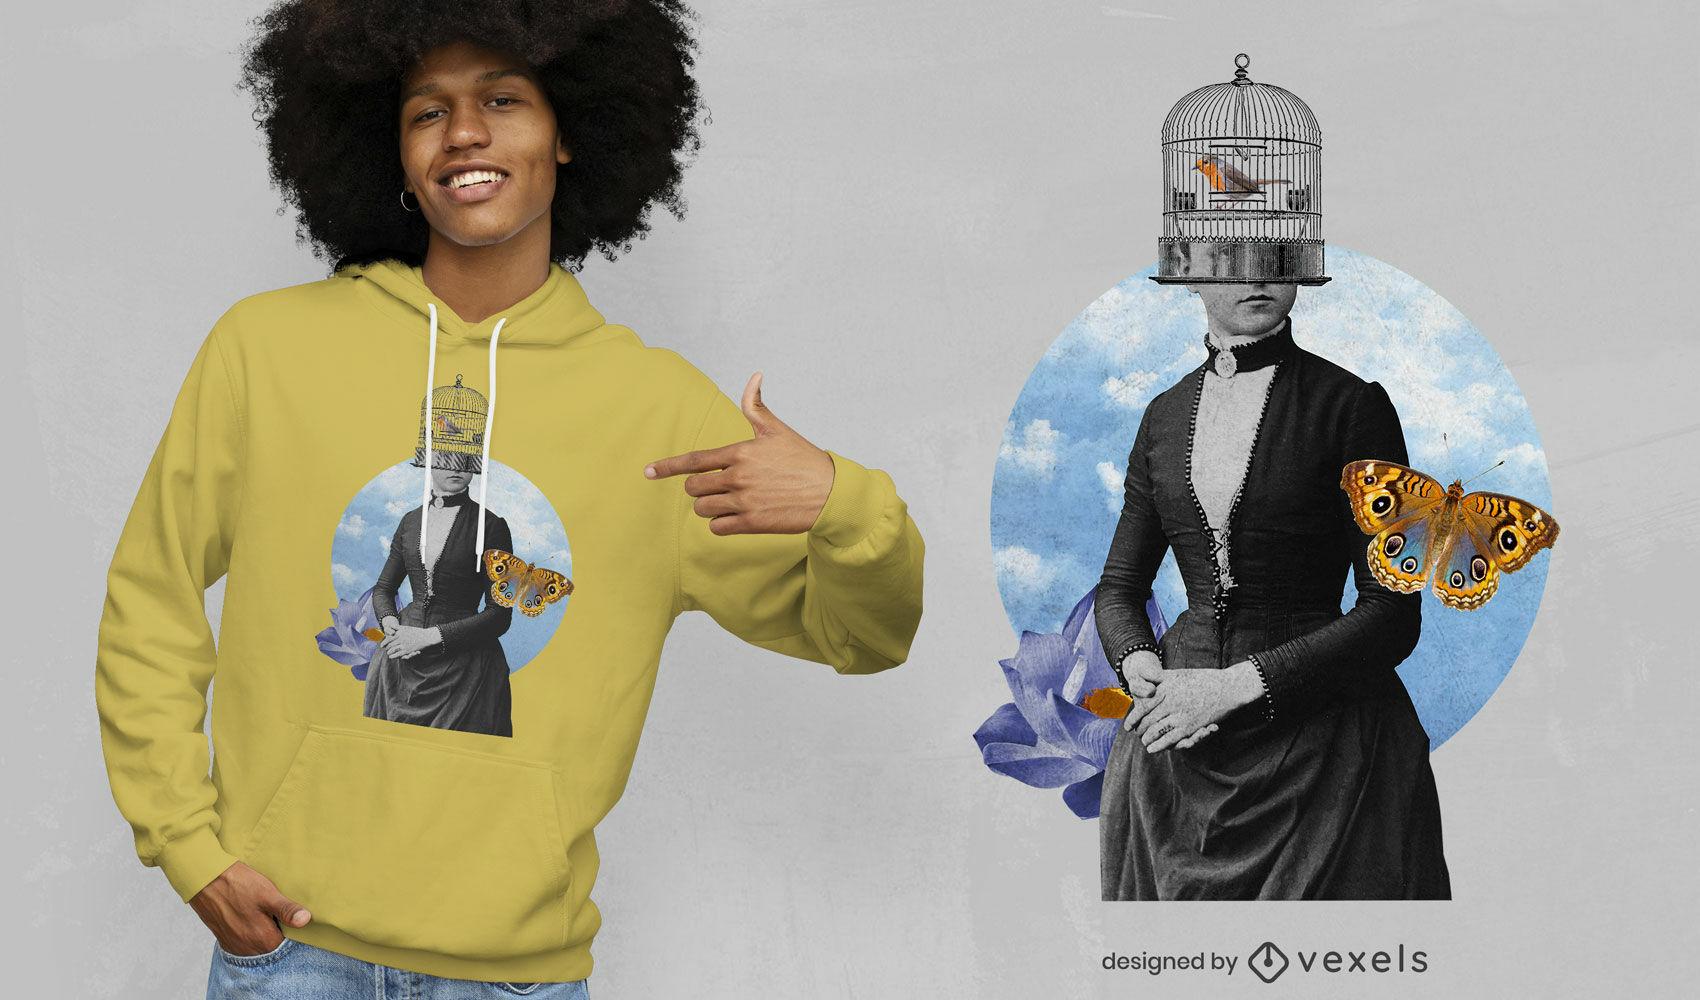 Diseño de camiseta psd de lady bird cage coillage